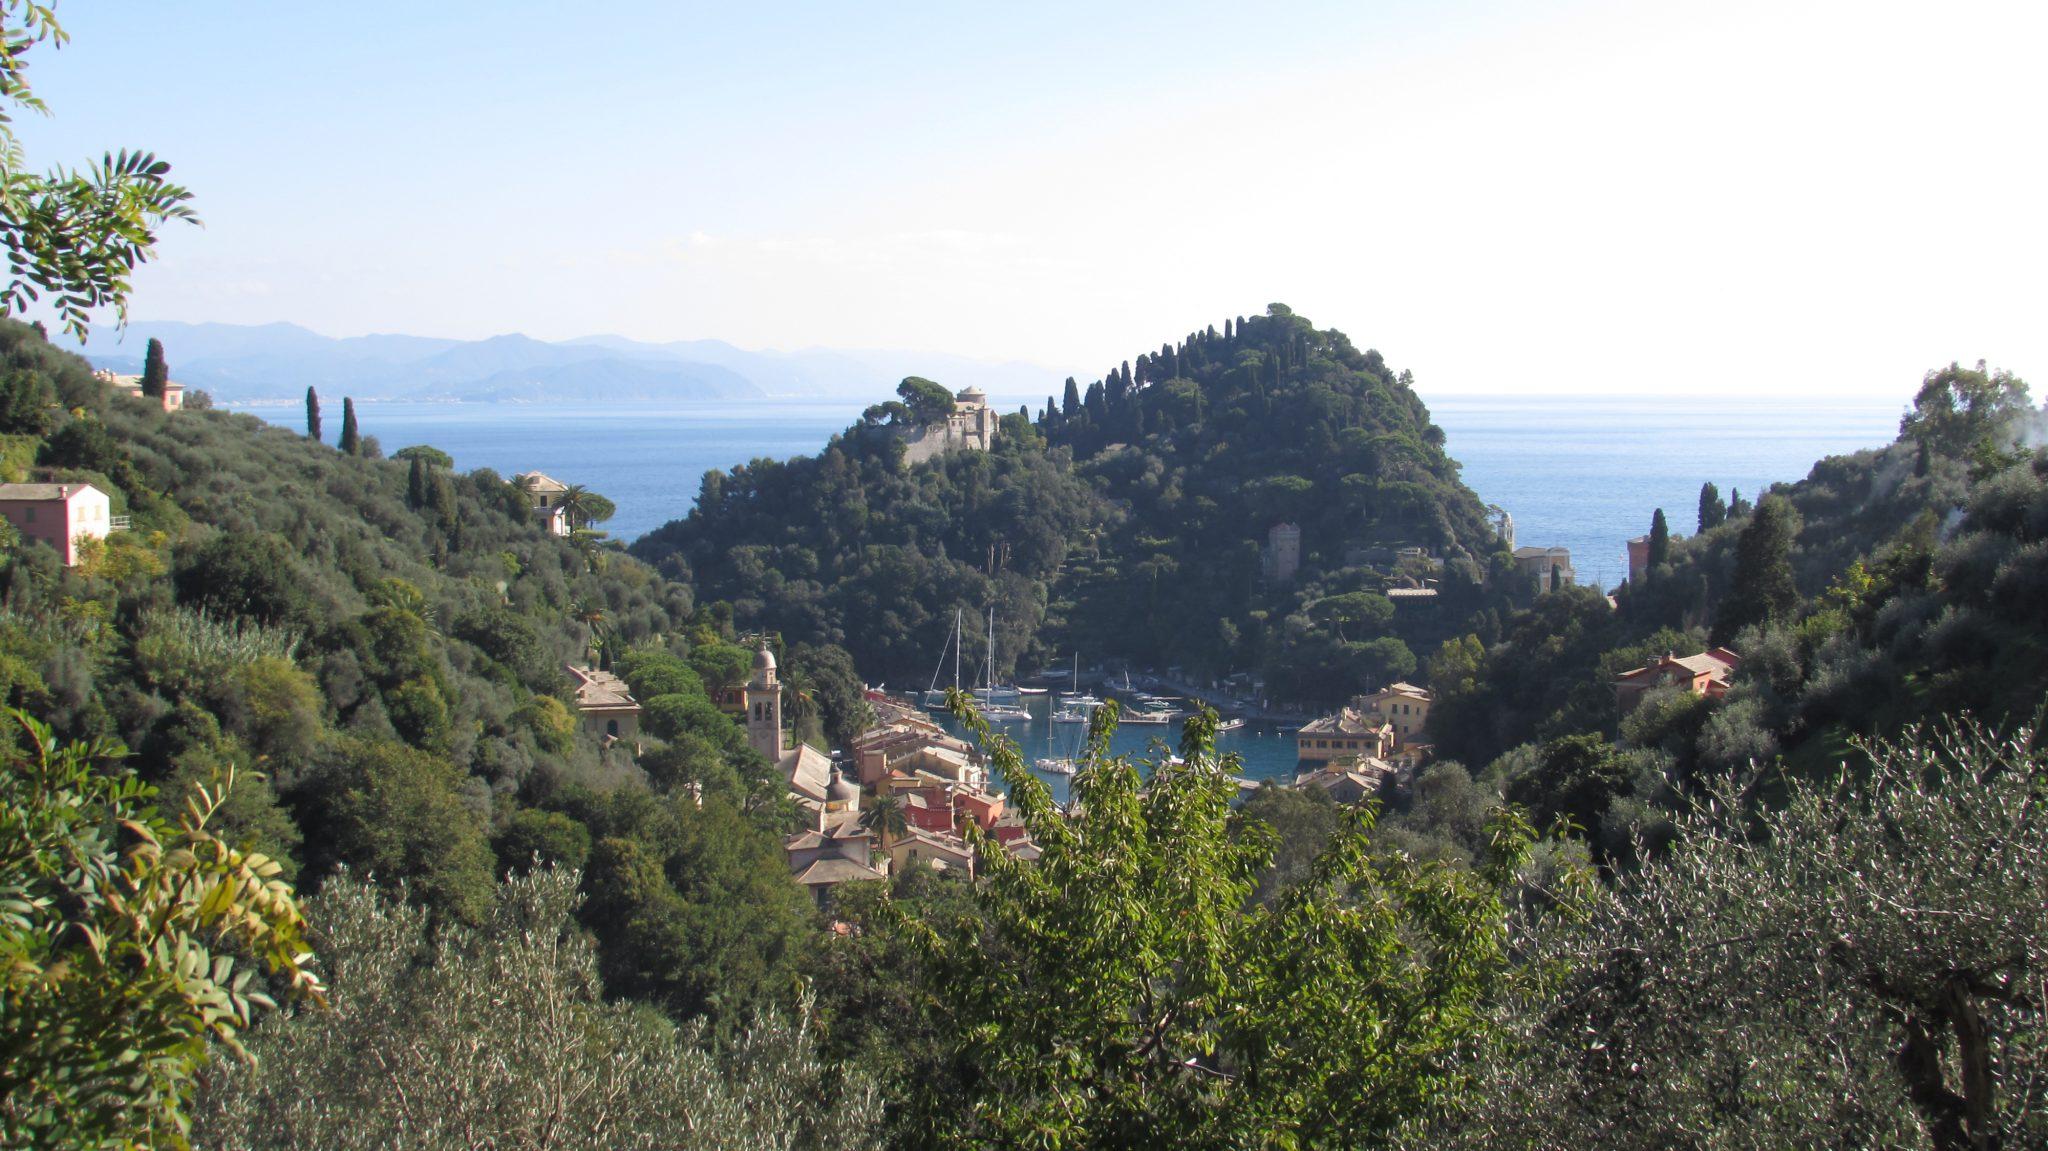 View from Portofino Promontory